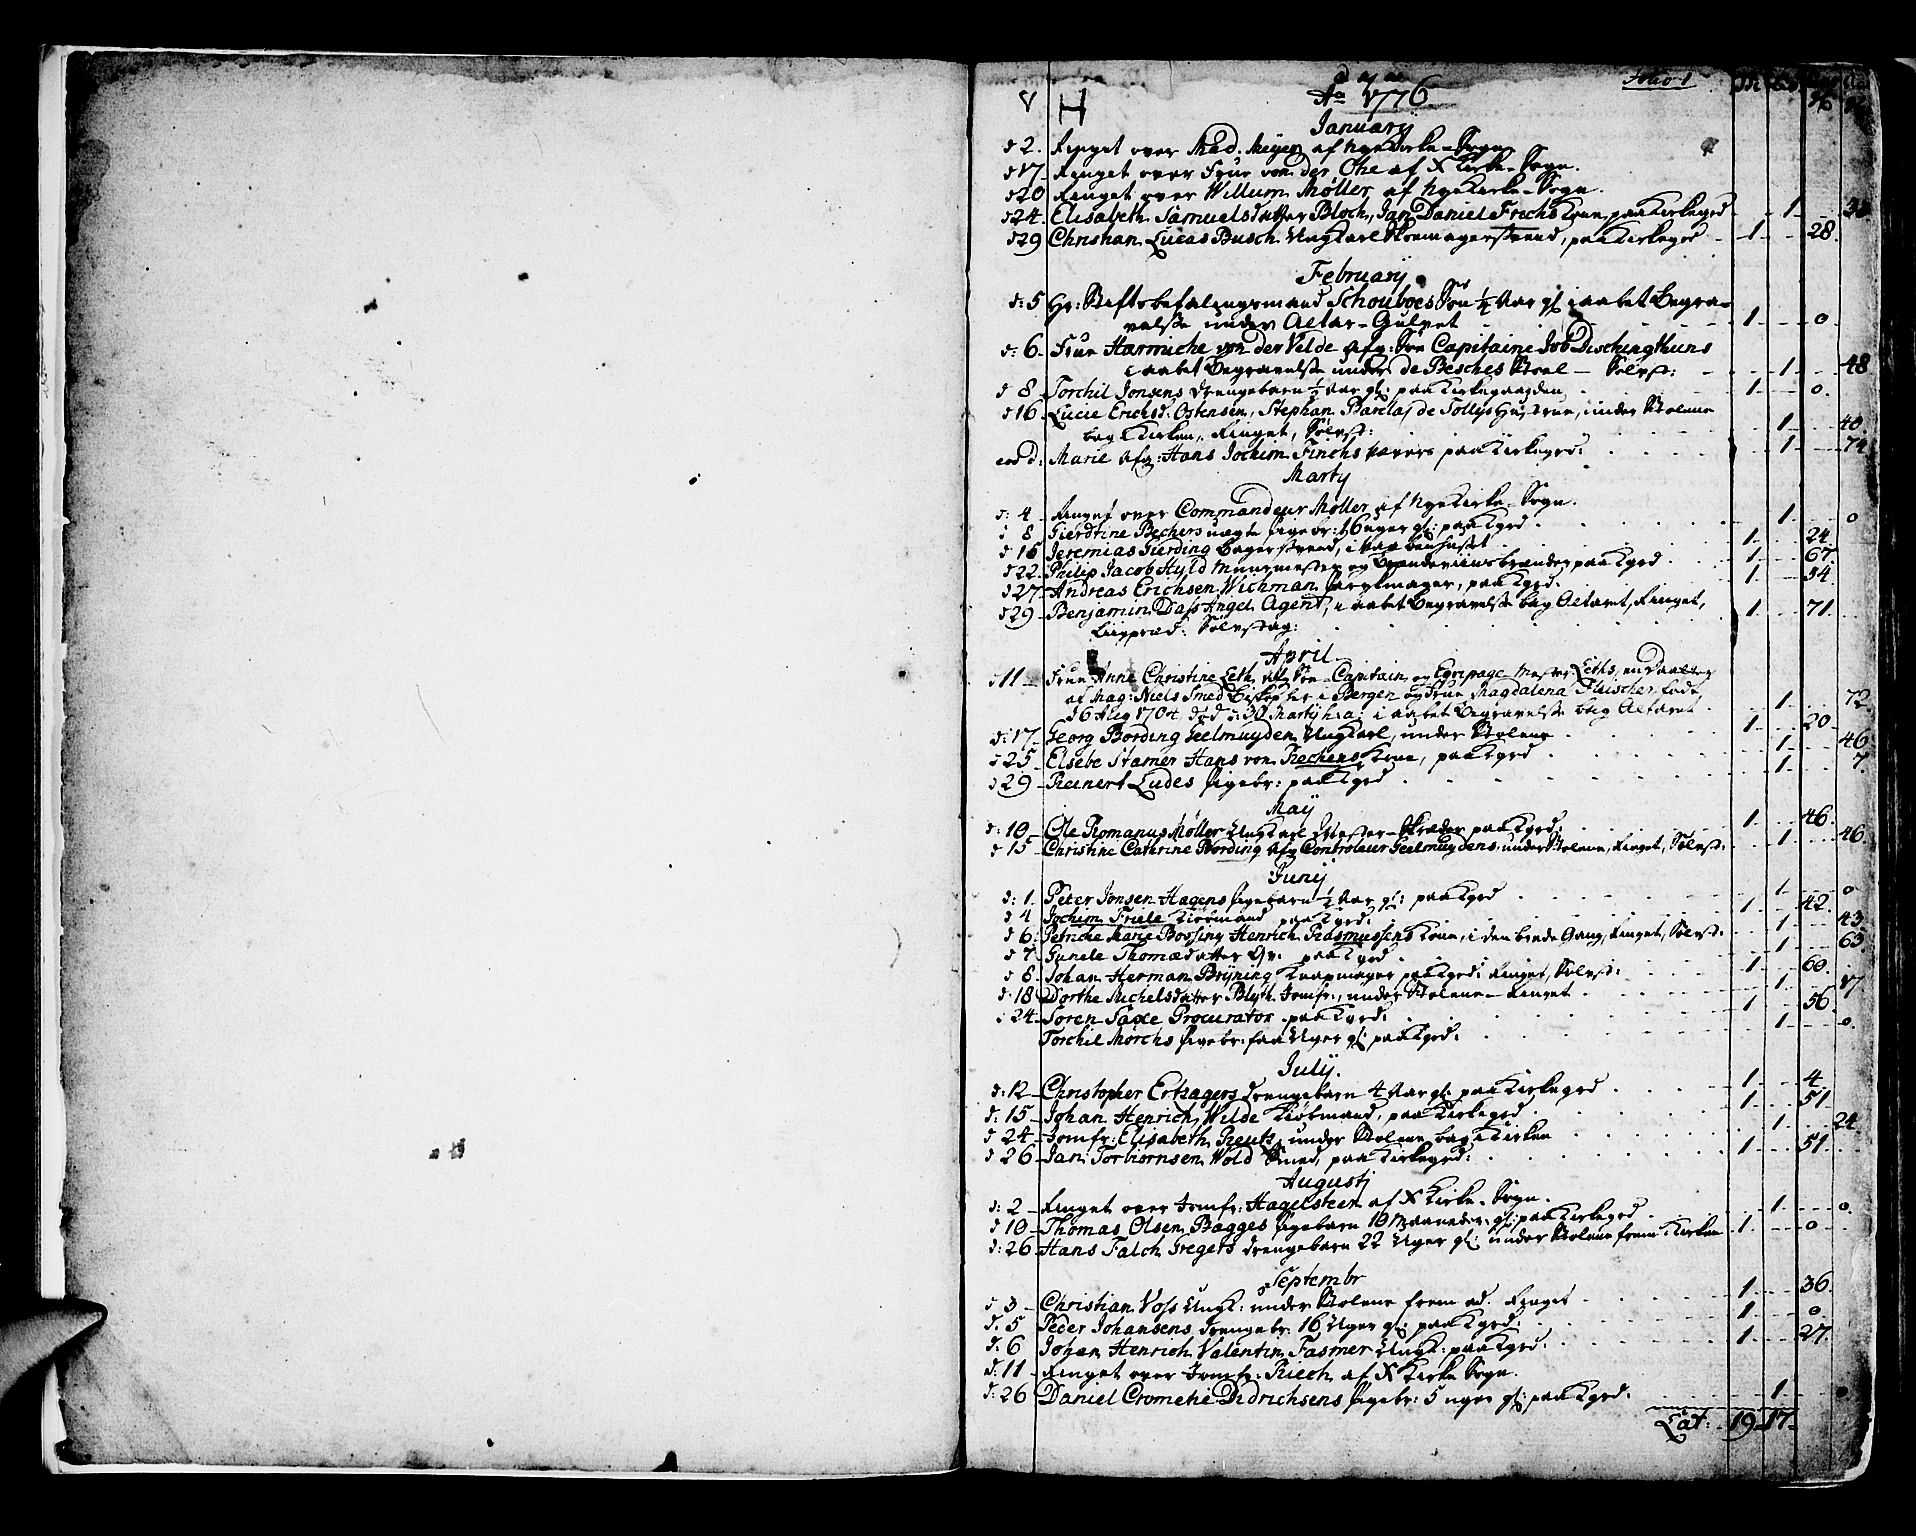 SAB, Domkirken sokneprestembete, H/Haa/L0009: Parish register (official) no. A 9, 1776-1821, p. 1